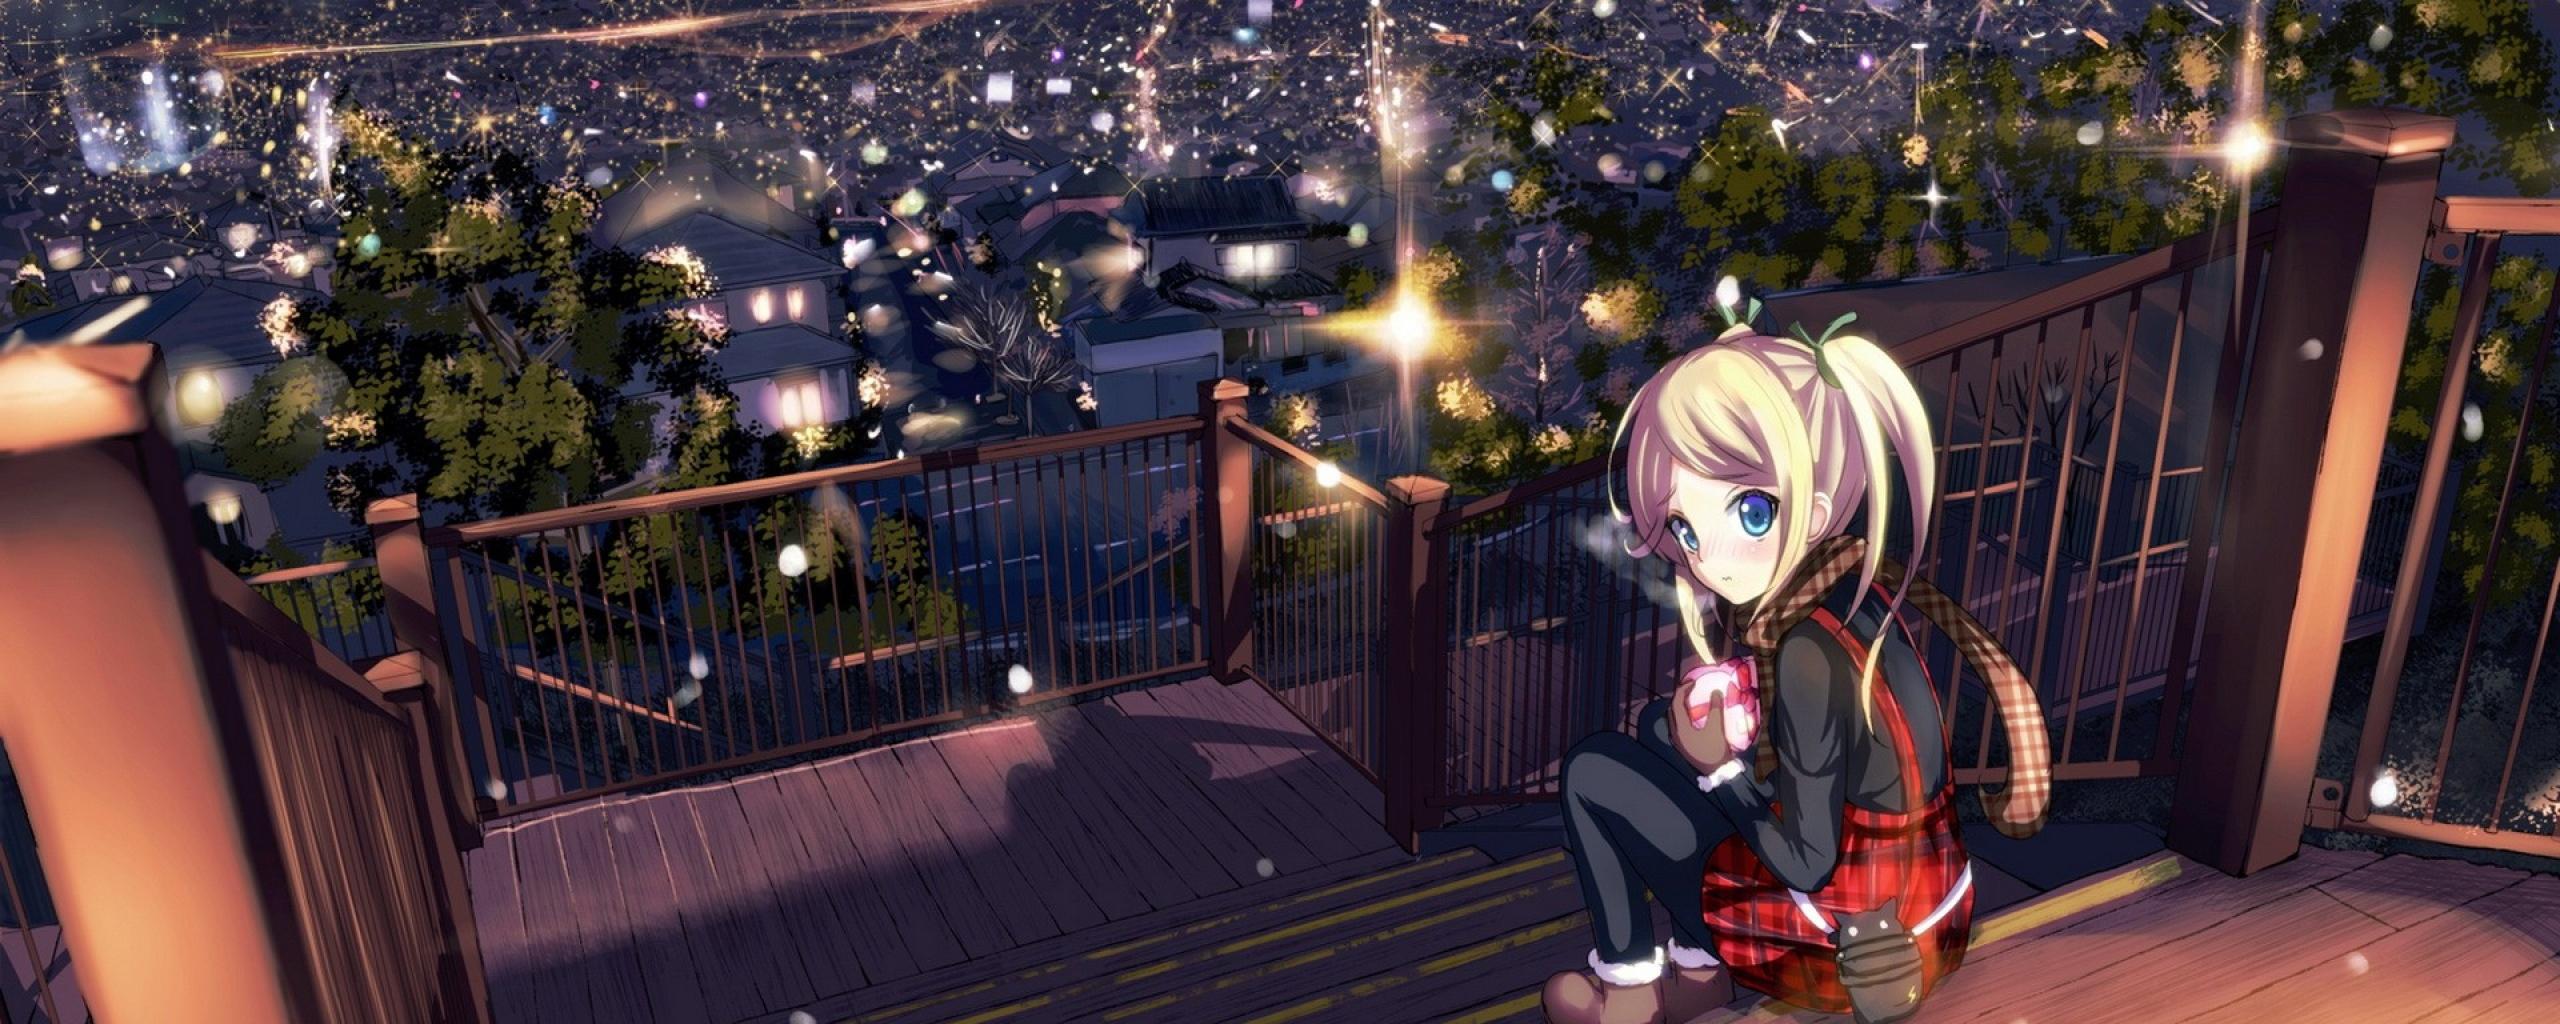 Anime Dual Monitor Backgrounds Free Download Pixelstalk Net